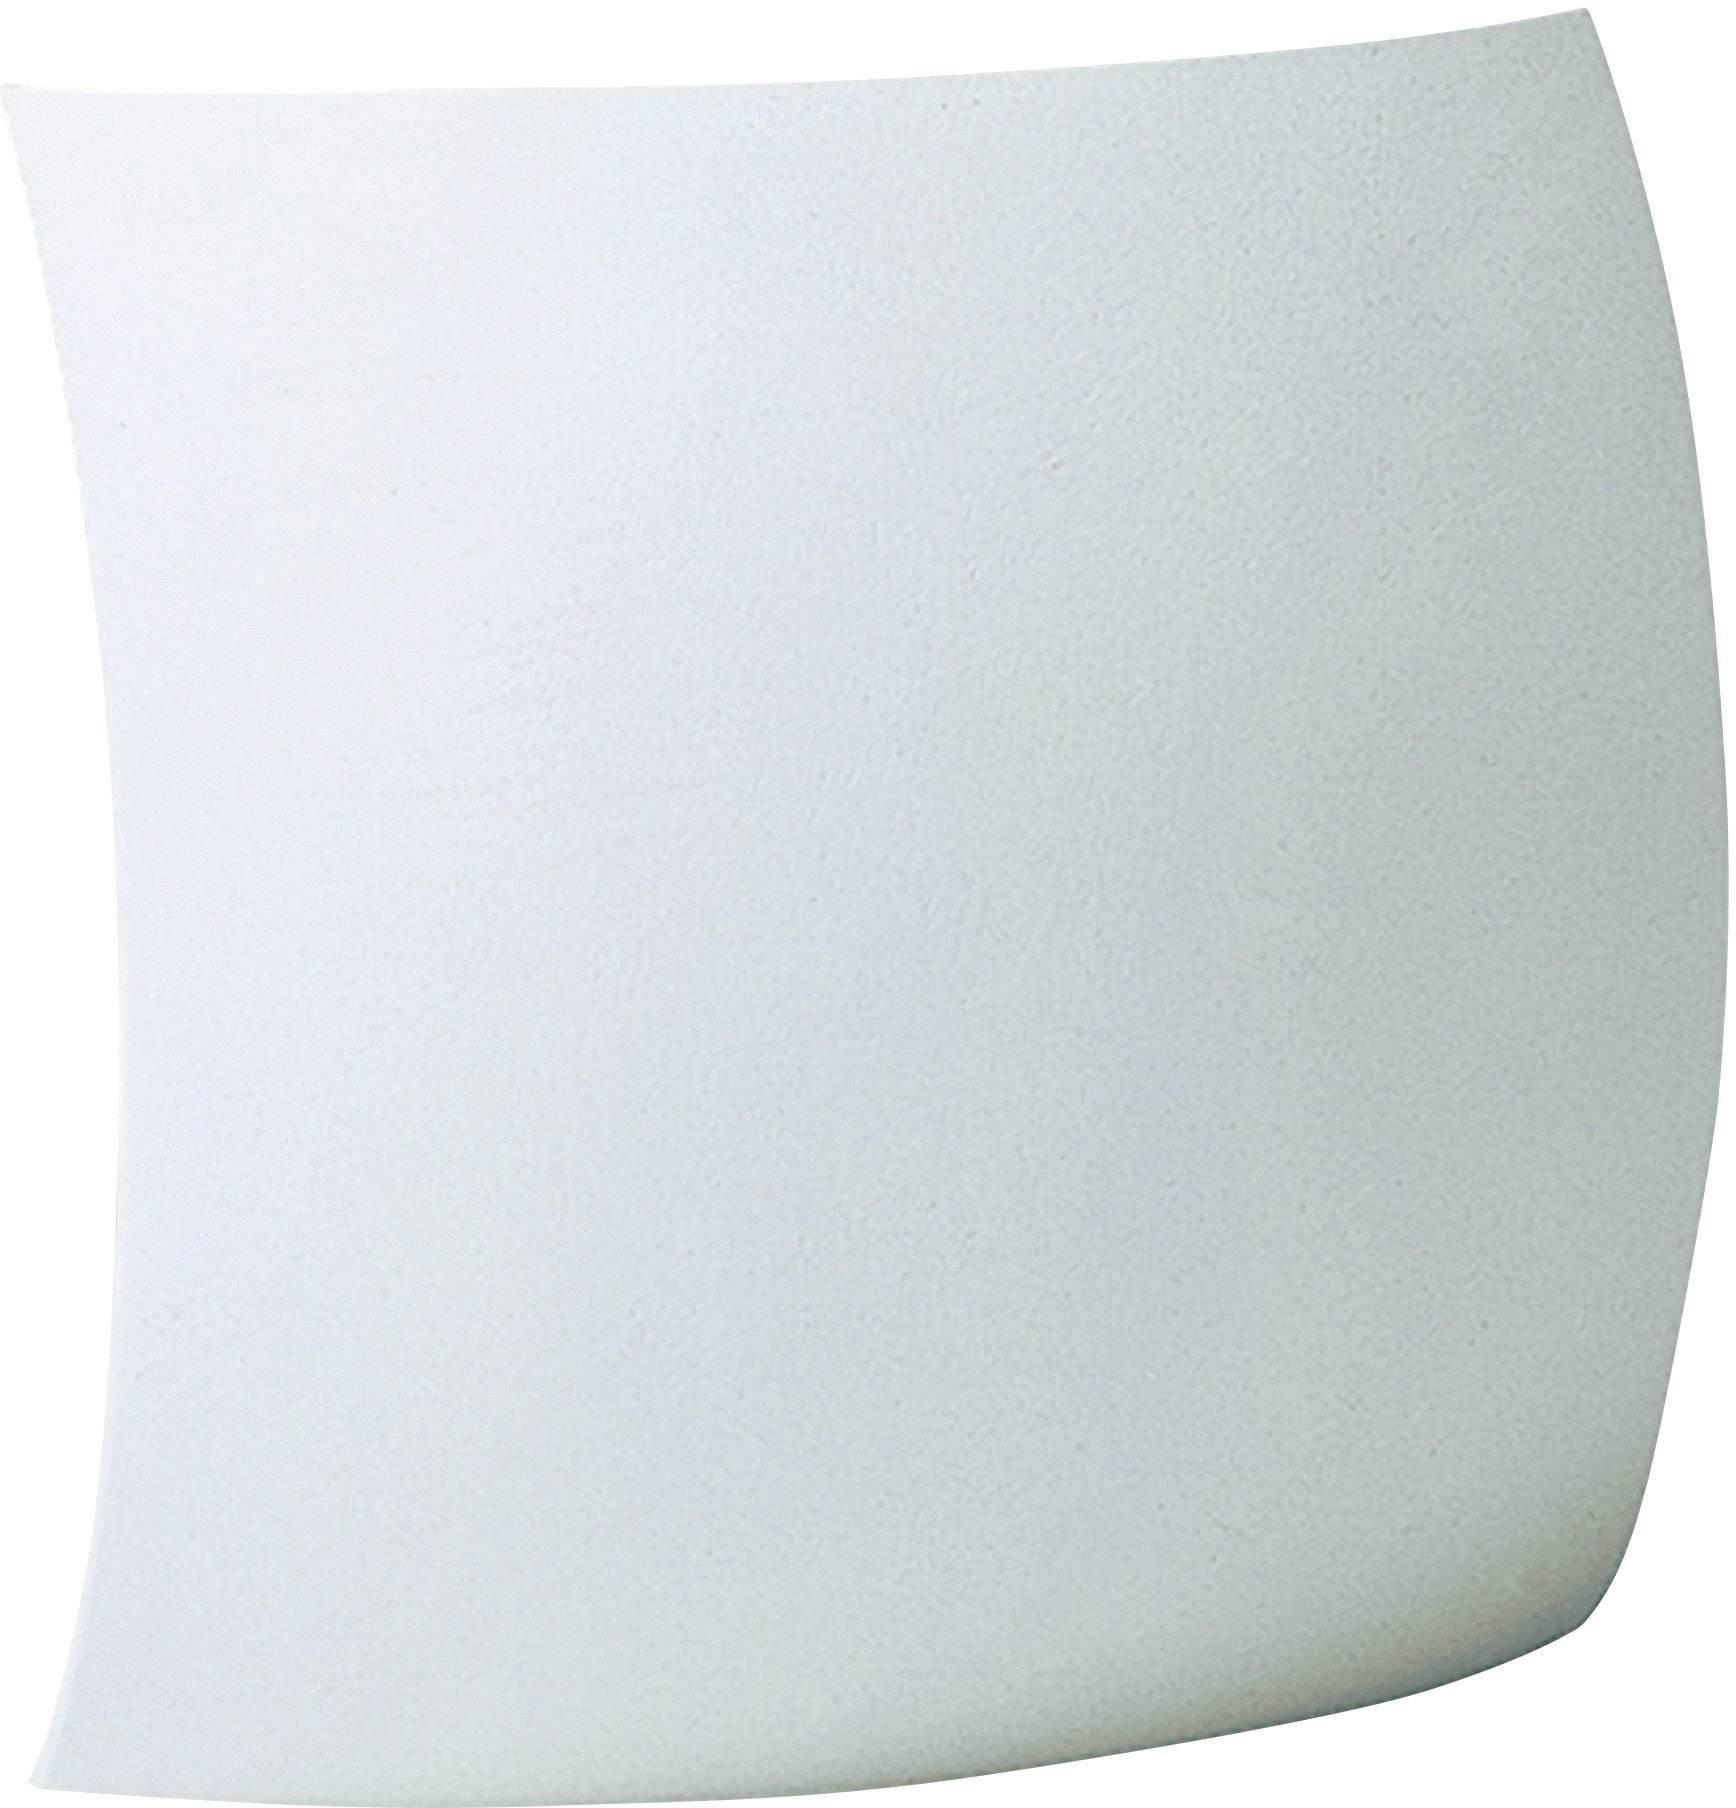 Gong Grothe Gong 225A 43225, 8 - 12 V, 83 dB (A), biela